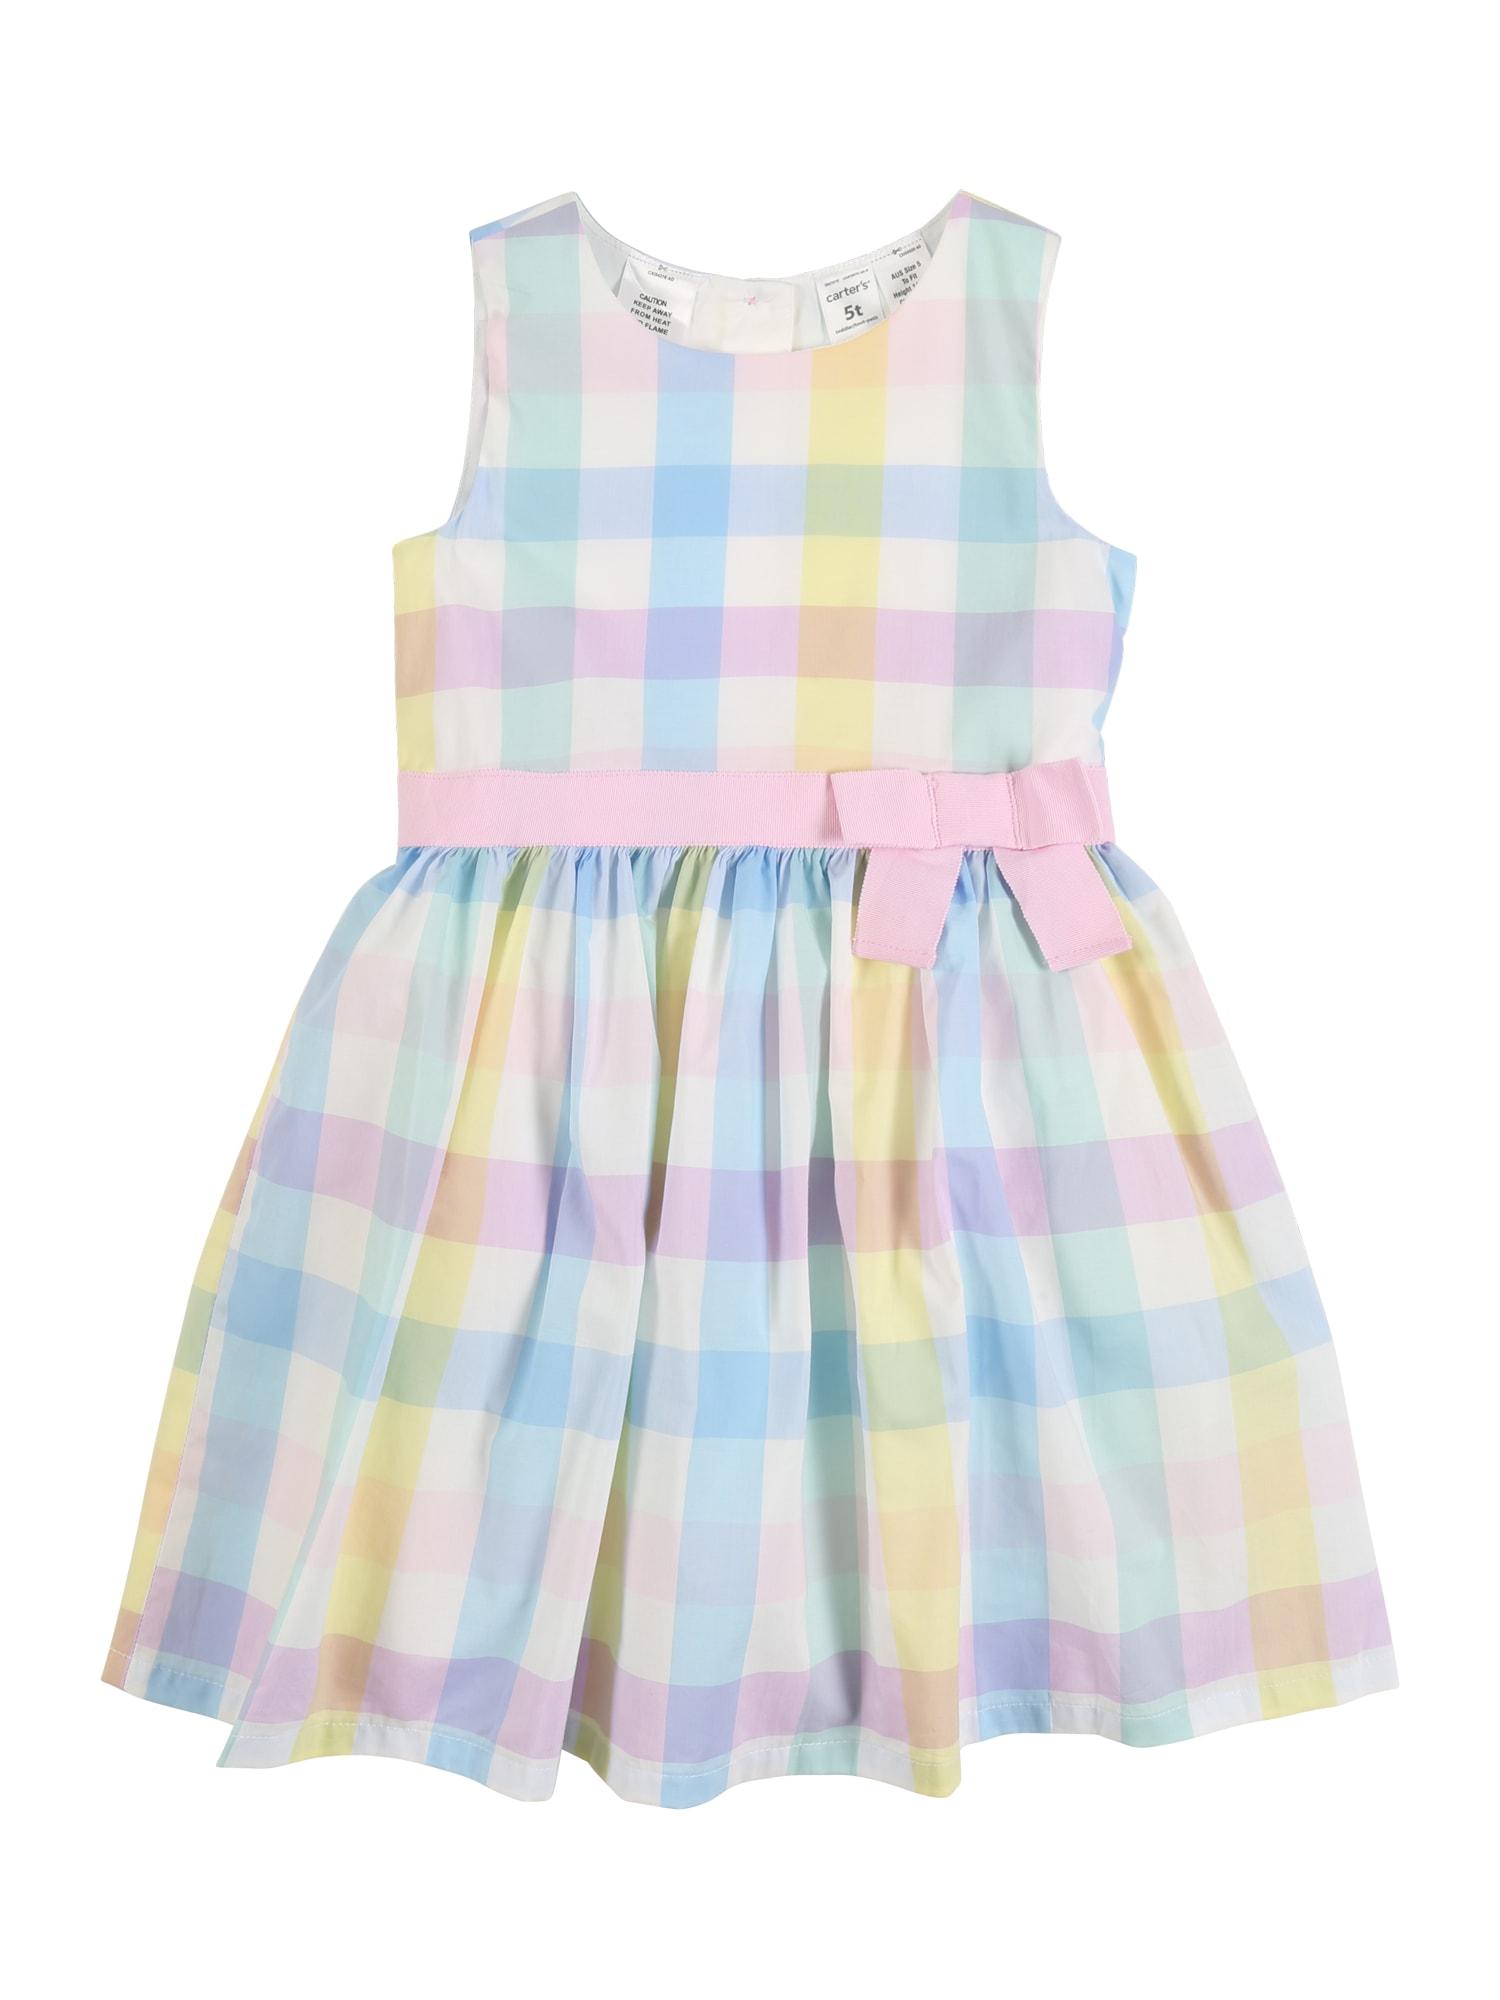 Carter's Suknelė 'Easter' mišrios spalvos